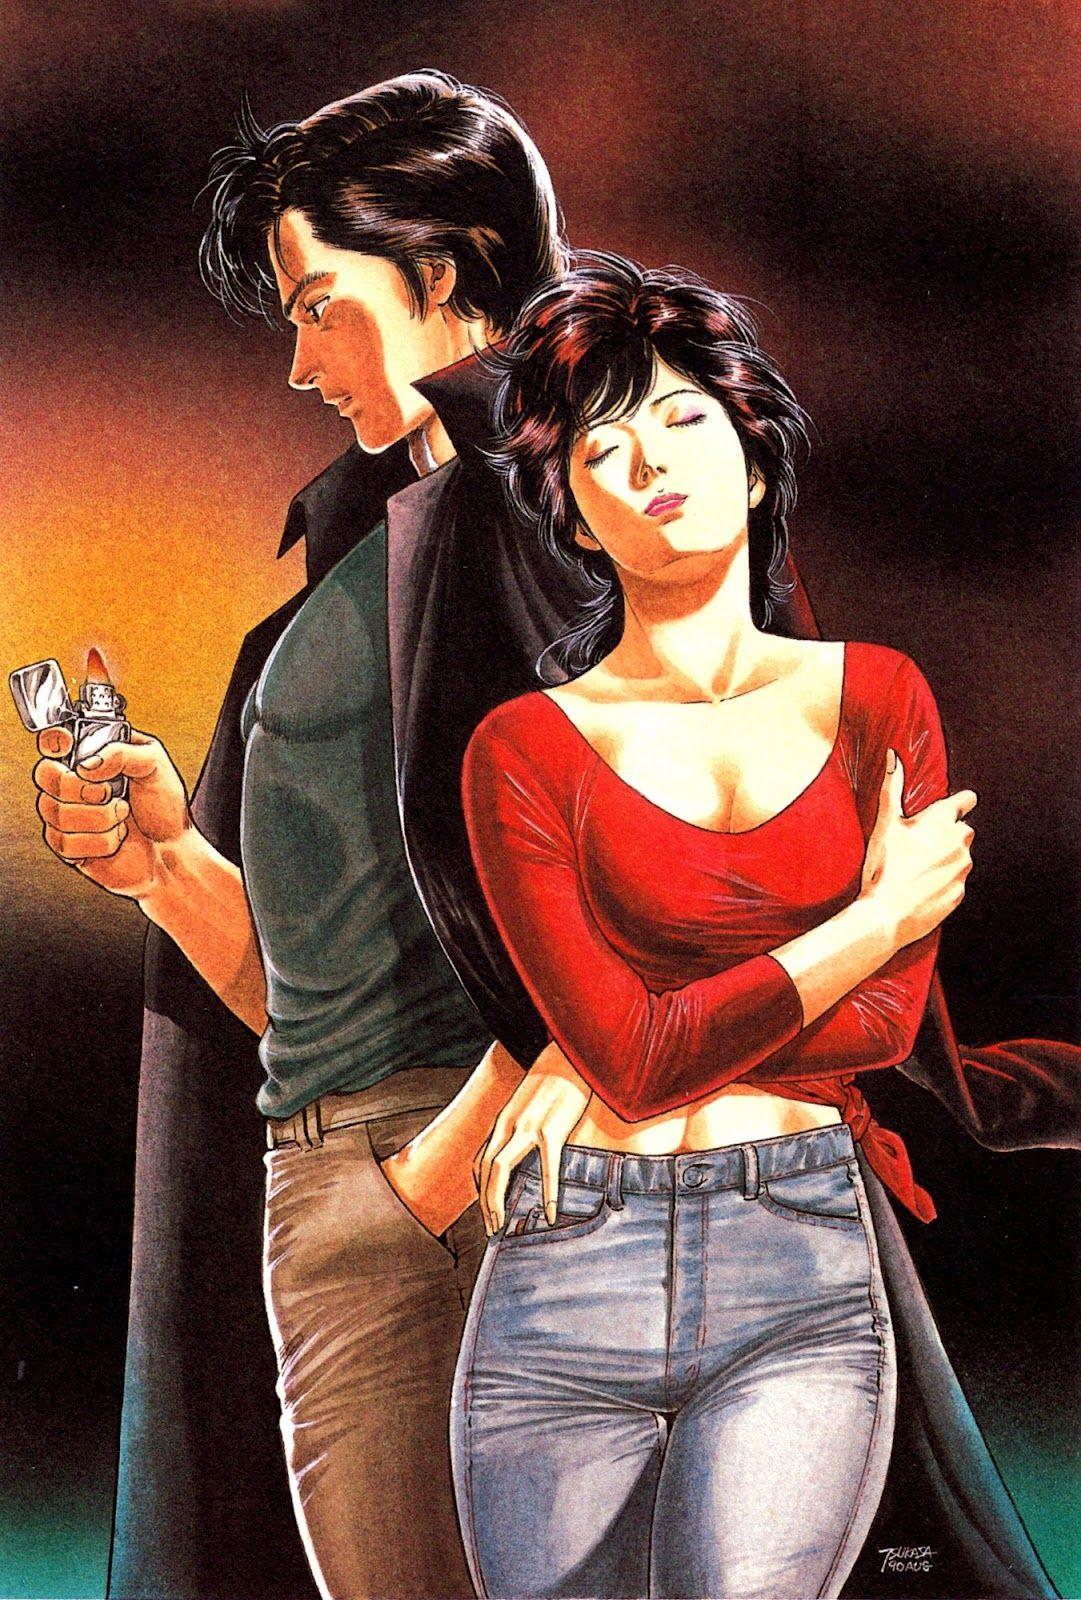 City Hunter By Tsukasa Hojo Nicki Larson City Hunter Vieux Dessins Animes